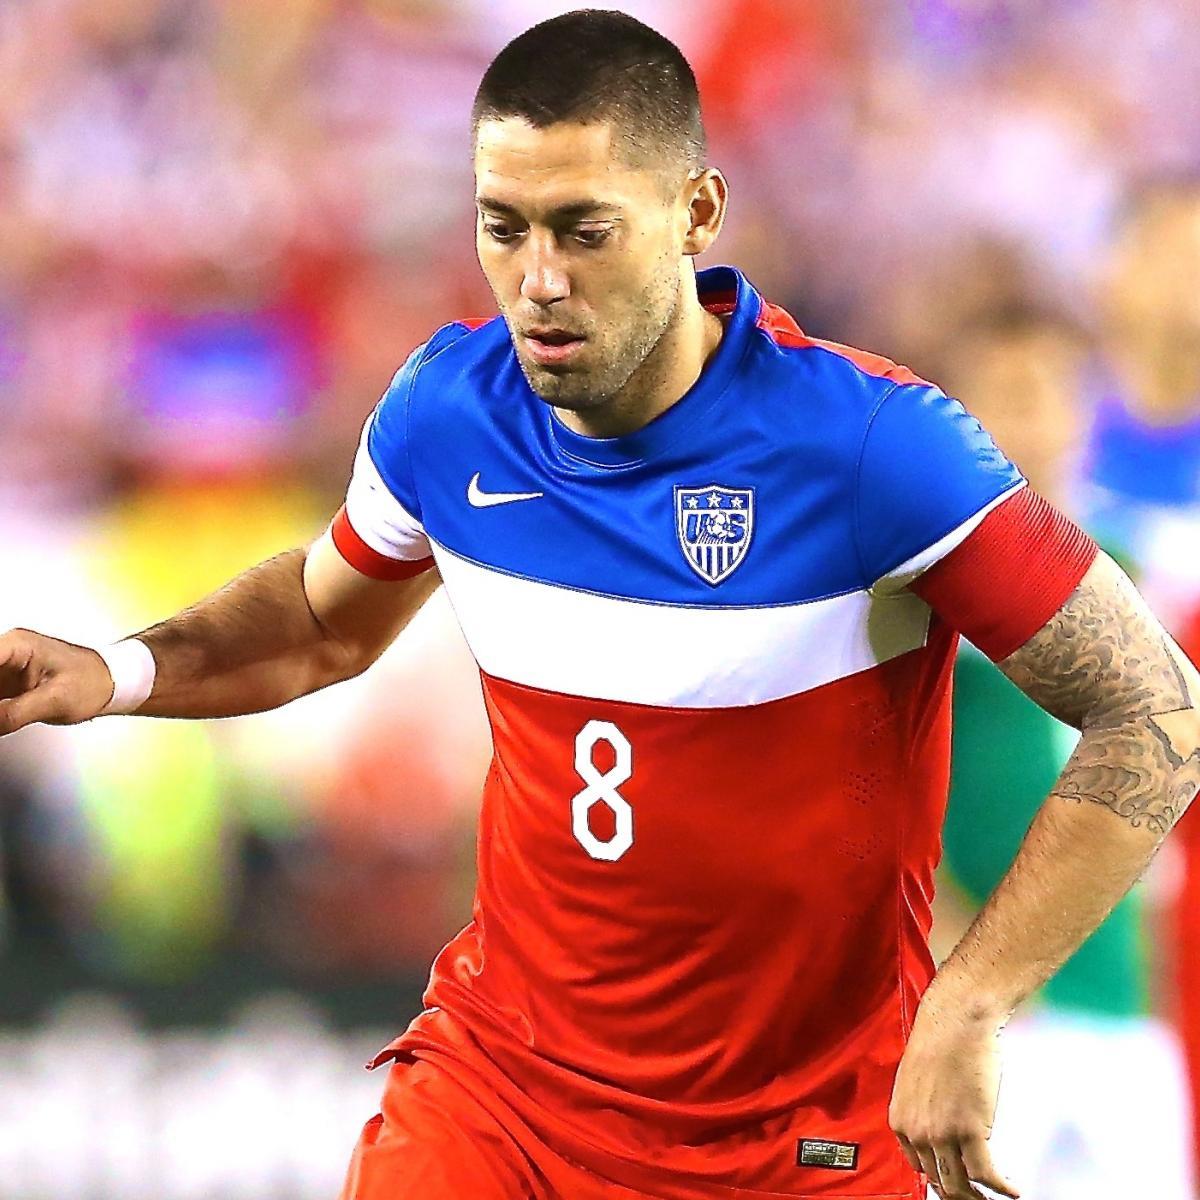 Work ethic defines U.S. soccer star Clint Dempsey ... |Clint Dempsey Hair